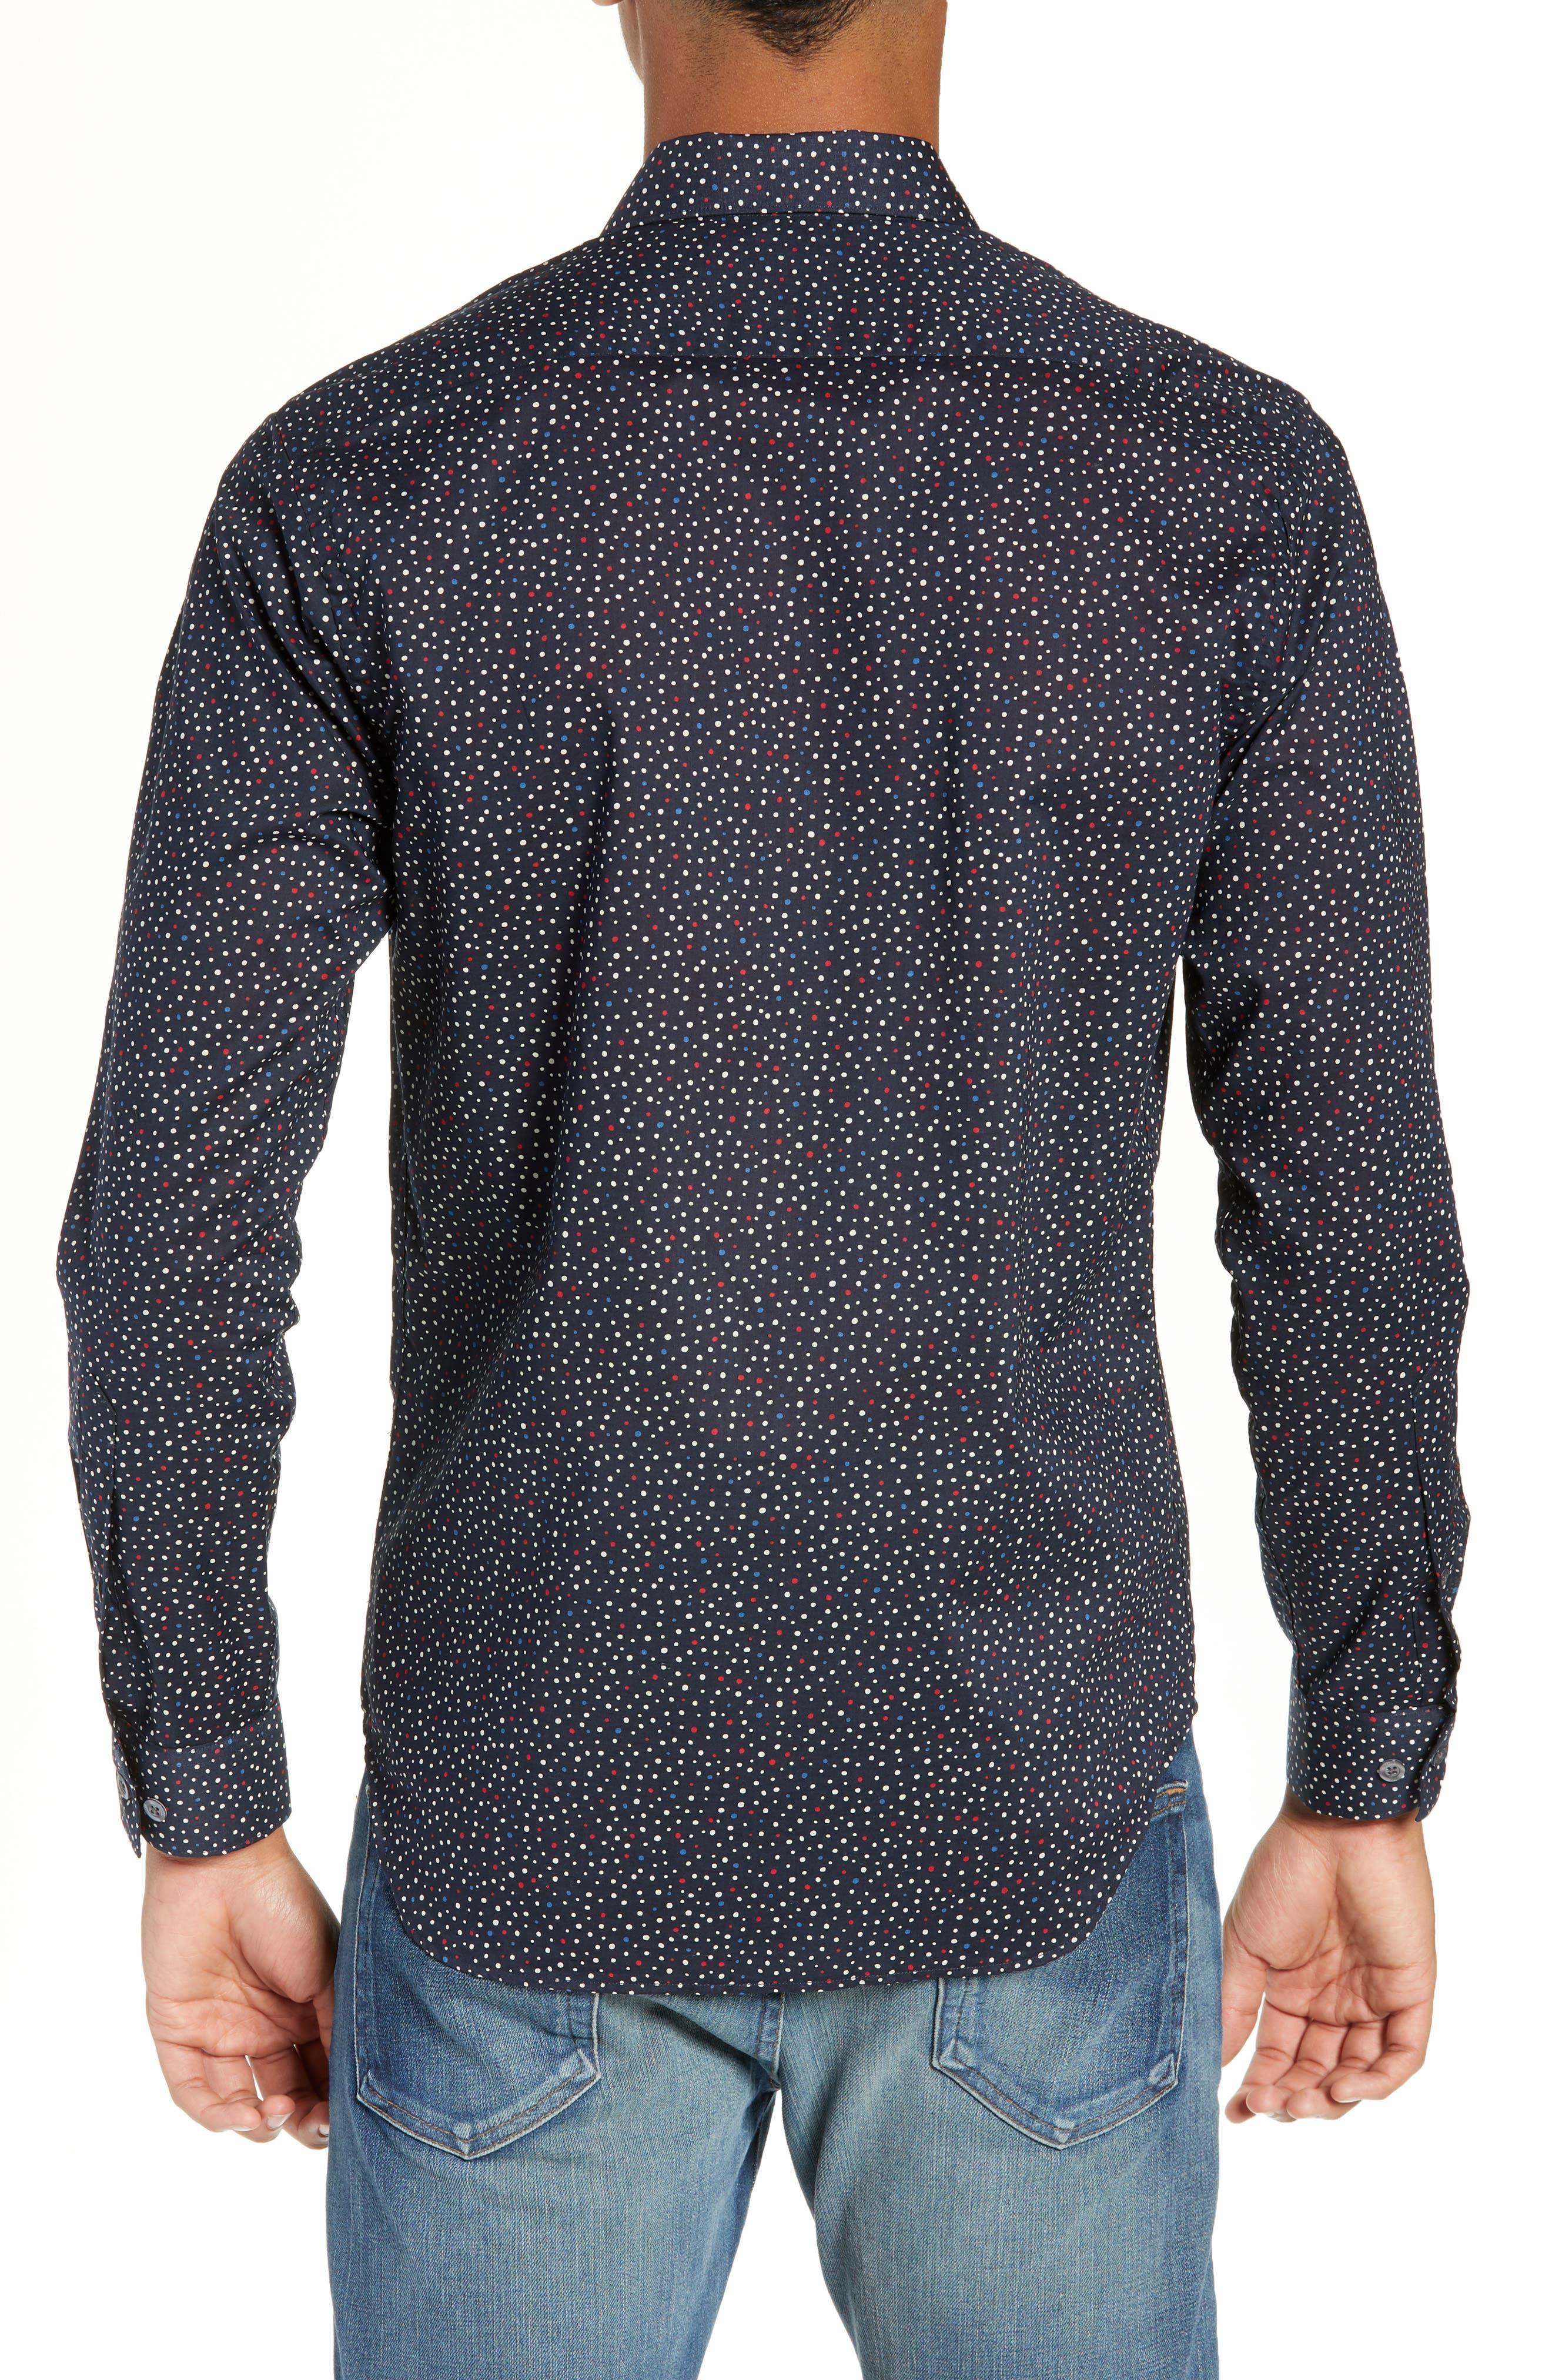 Jenks Slim Fit Long Sleeve Sport Shirt,                             Alternate thumbnail 3, color,                             BLACK